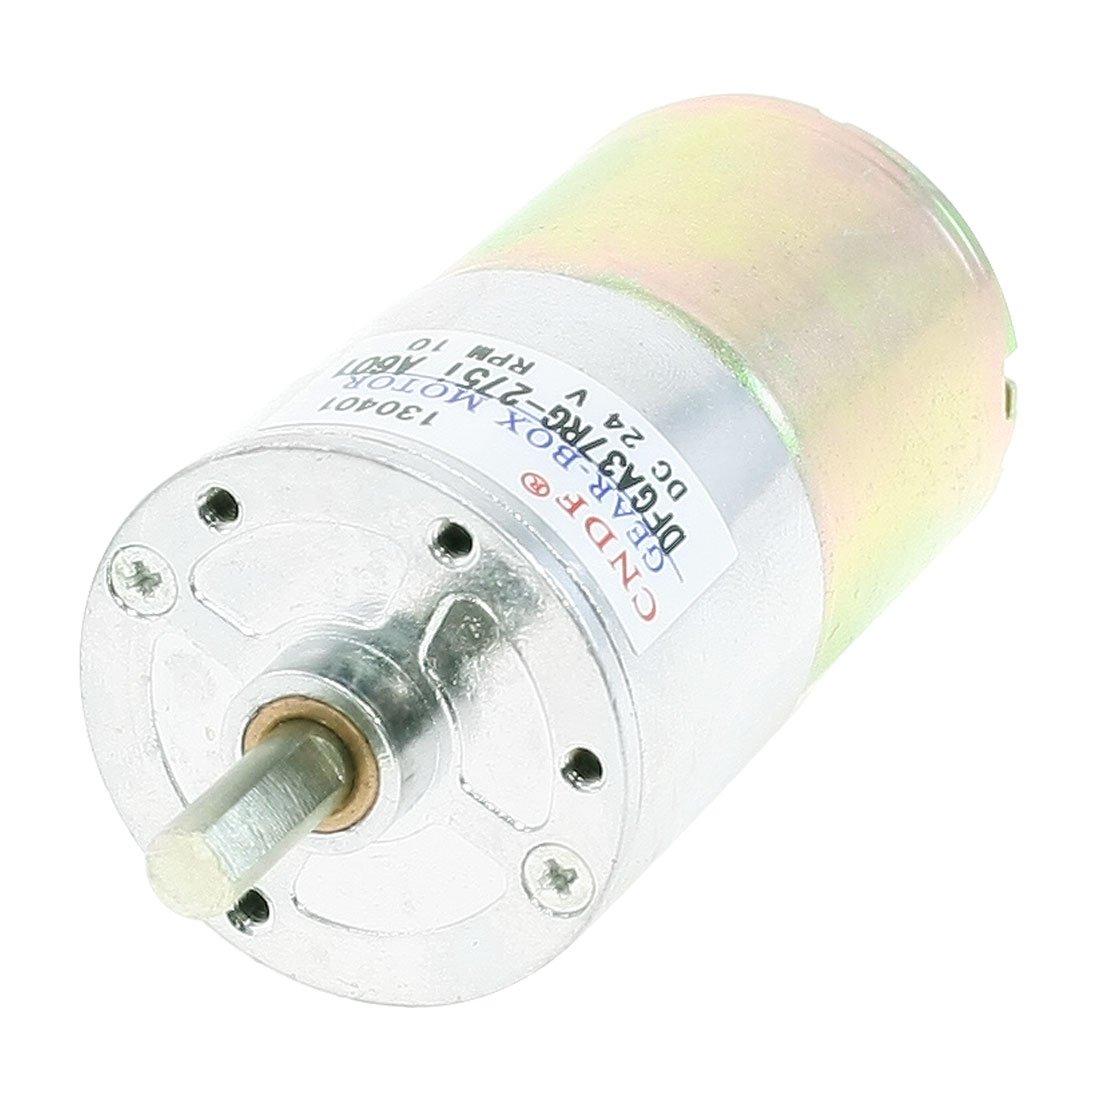 uxcell 13.14kg.cm Torque Terminal Magnetic Gear Motor 10 RPM 24V DC